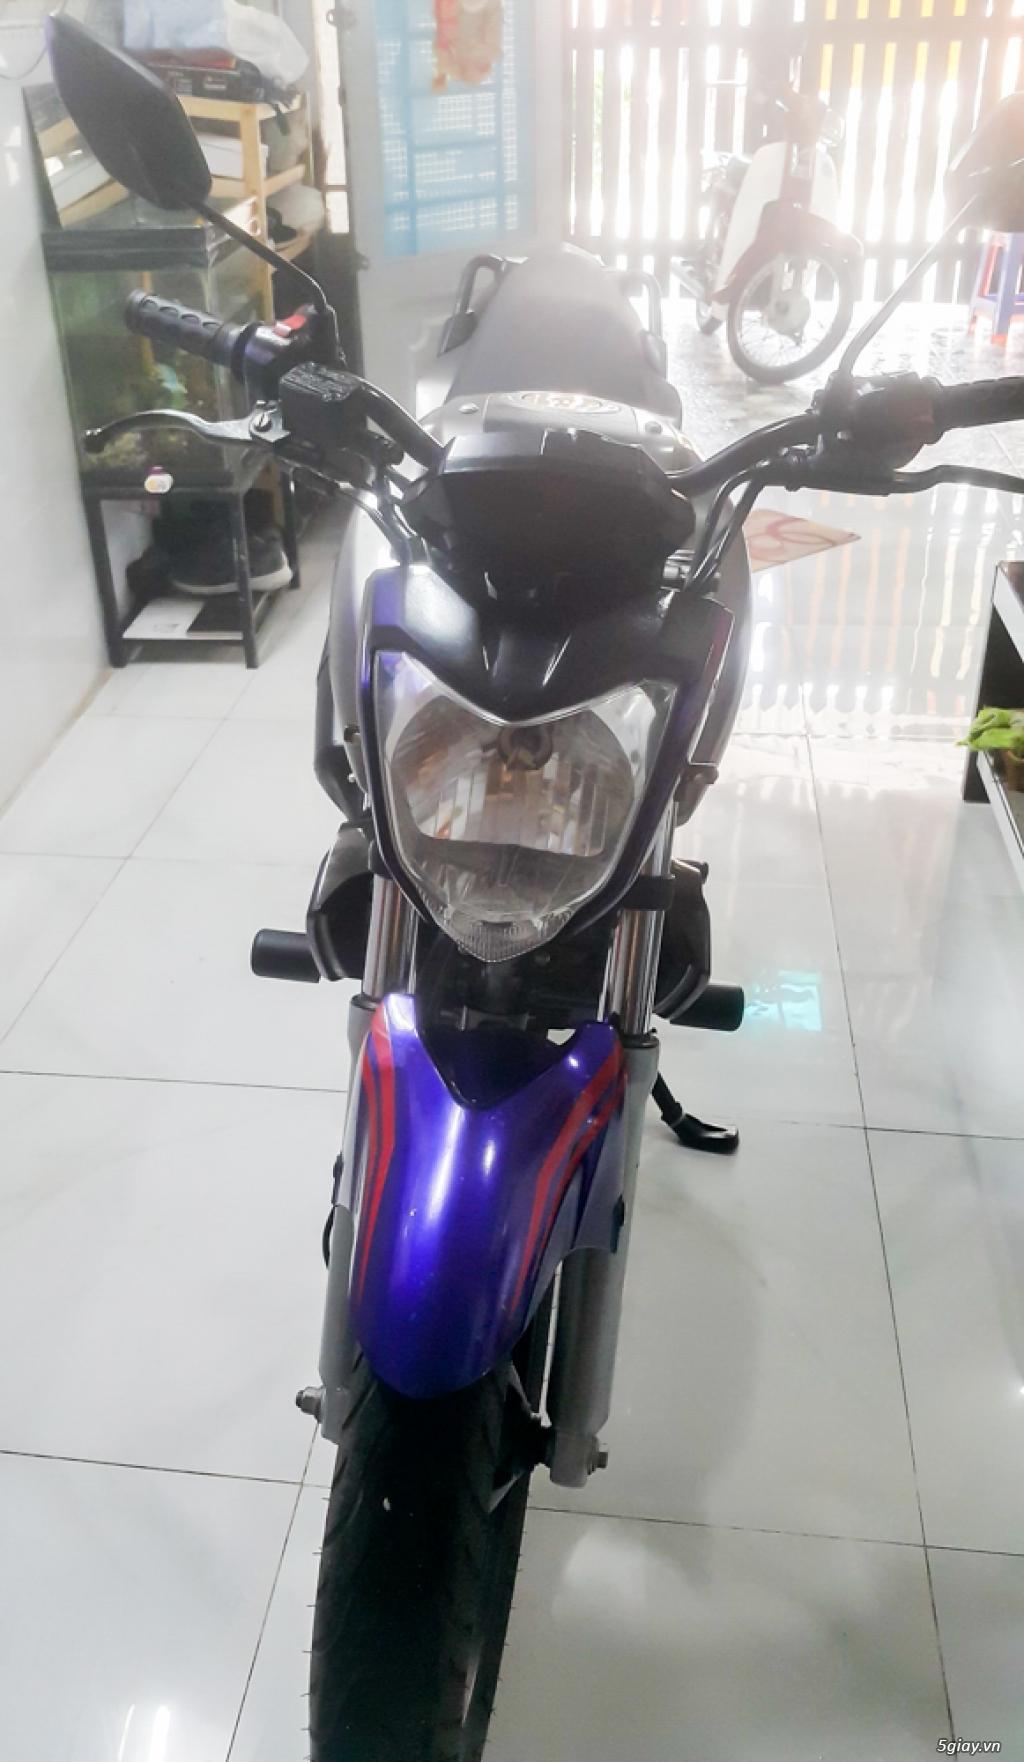 Xe MoTo Yamaha FZ16 153cc HQCN Biển Số Sang - 1